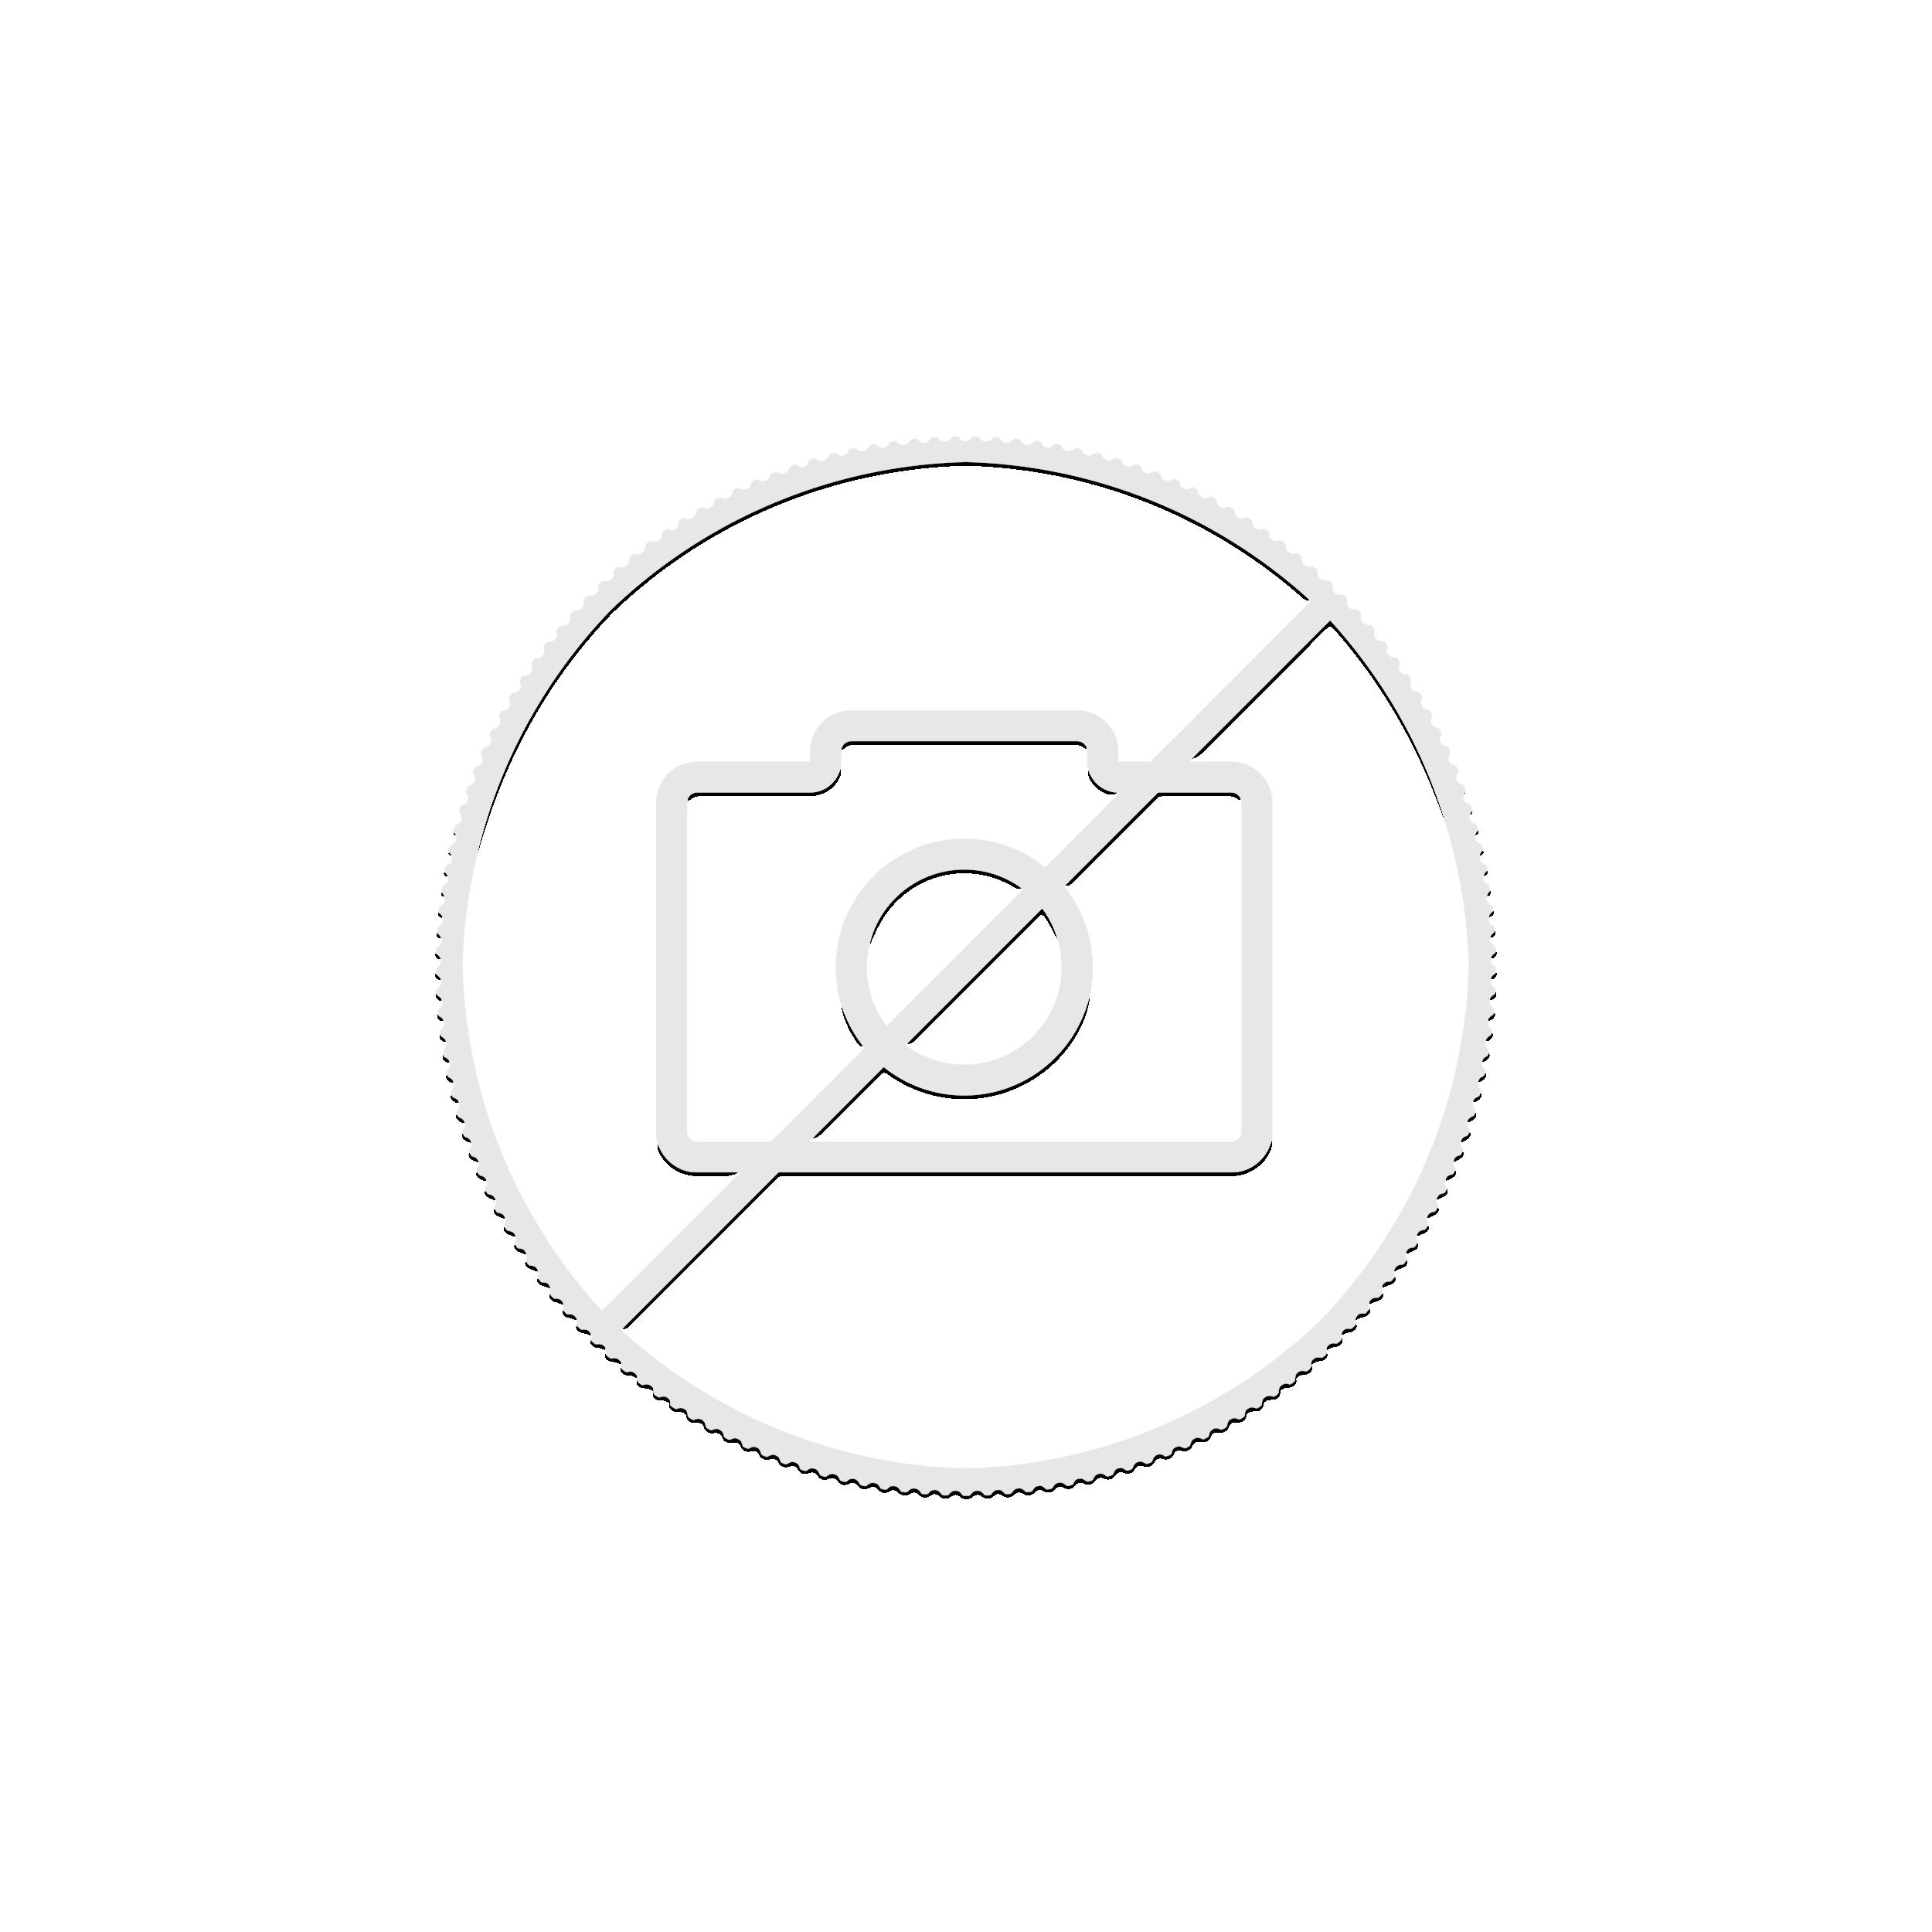 Zilveren munt Maple Leaf Canadese esdoornblad broche legacy 2020